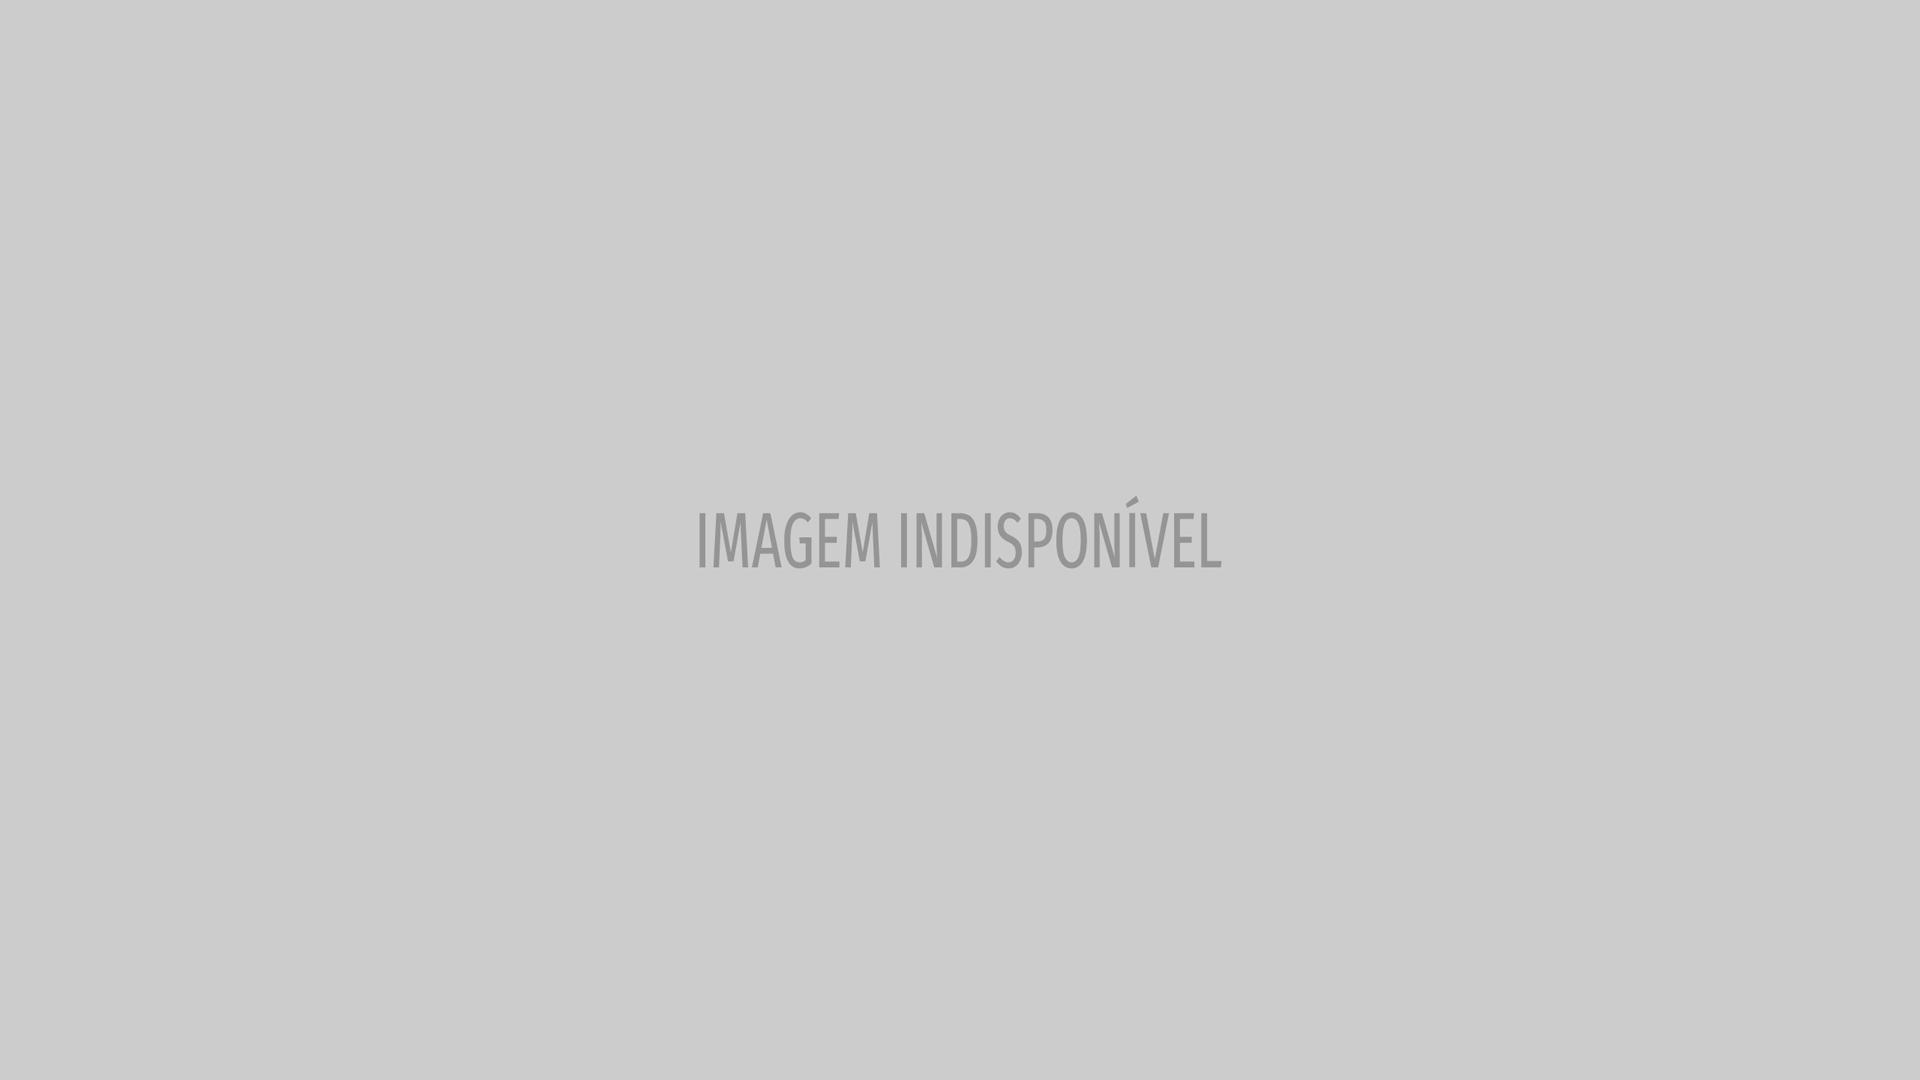 Liliana Aguiar responde (finalmente) a rumores de gravidez